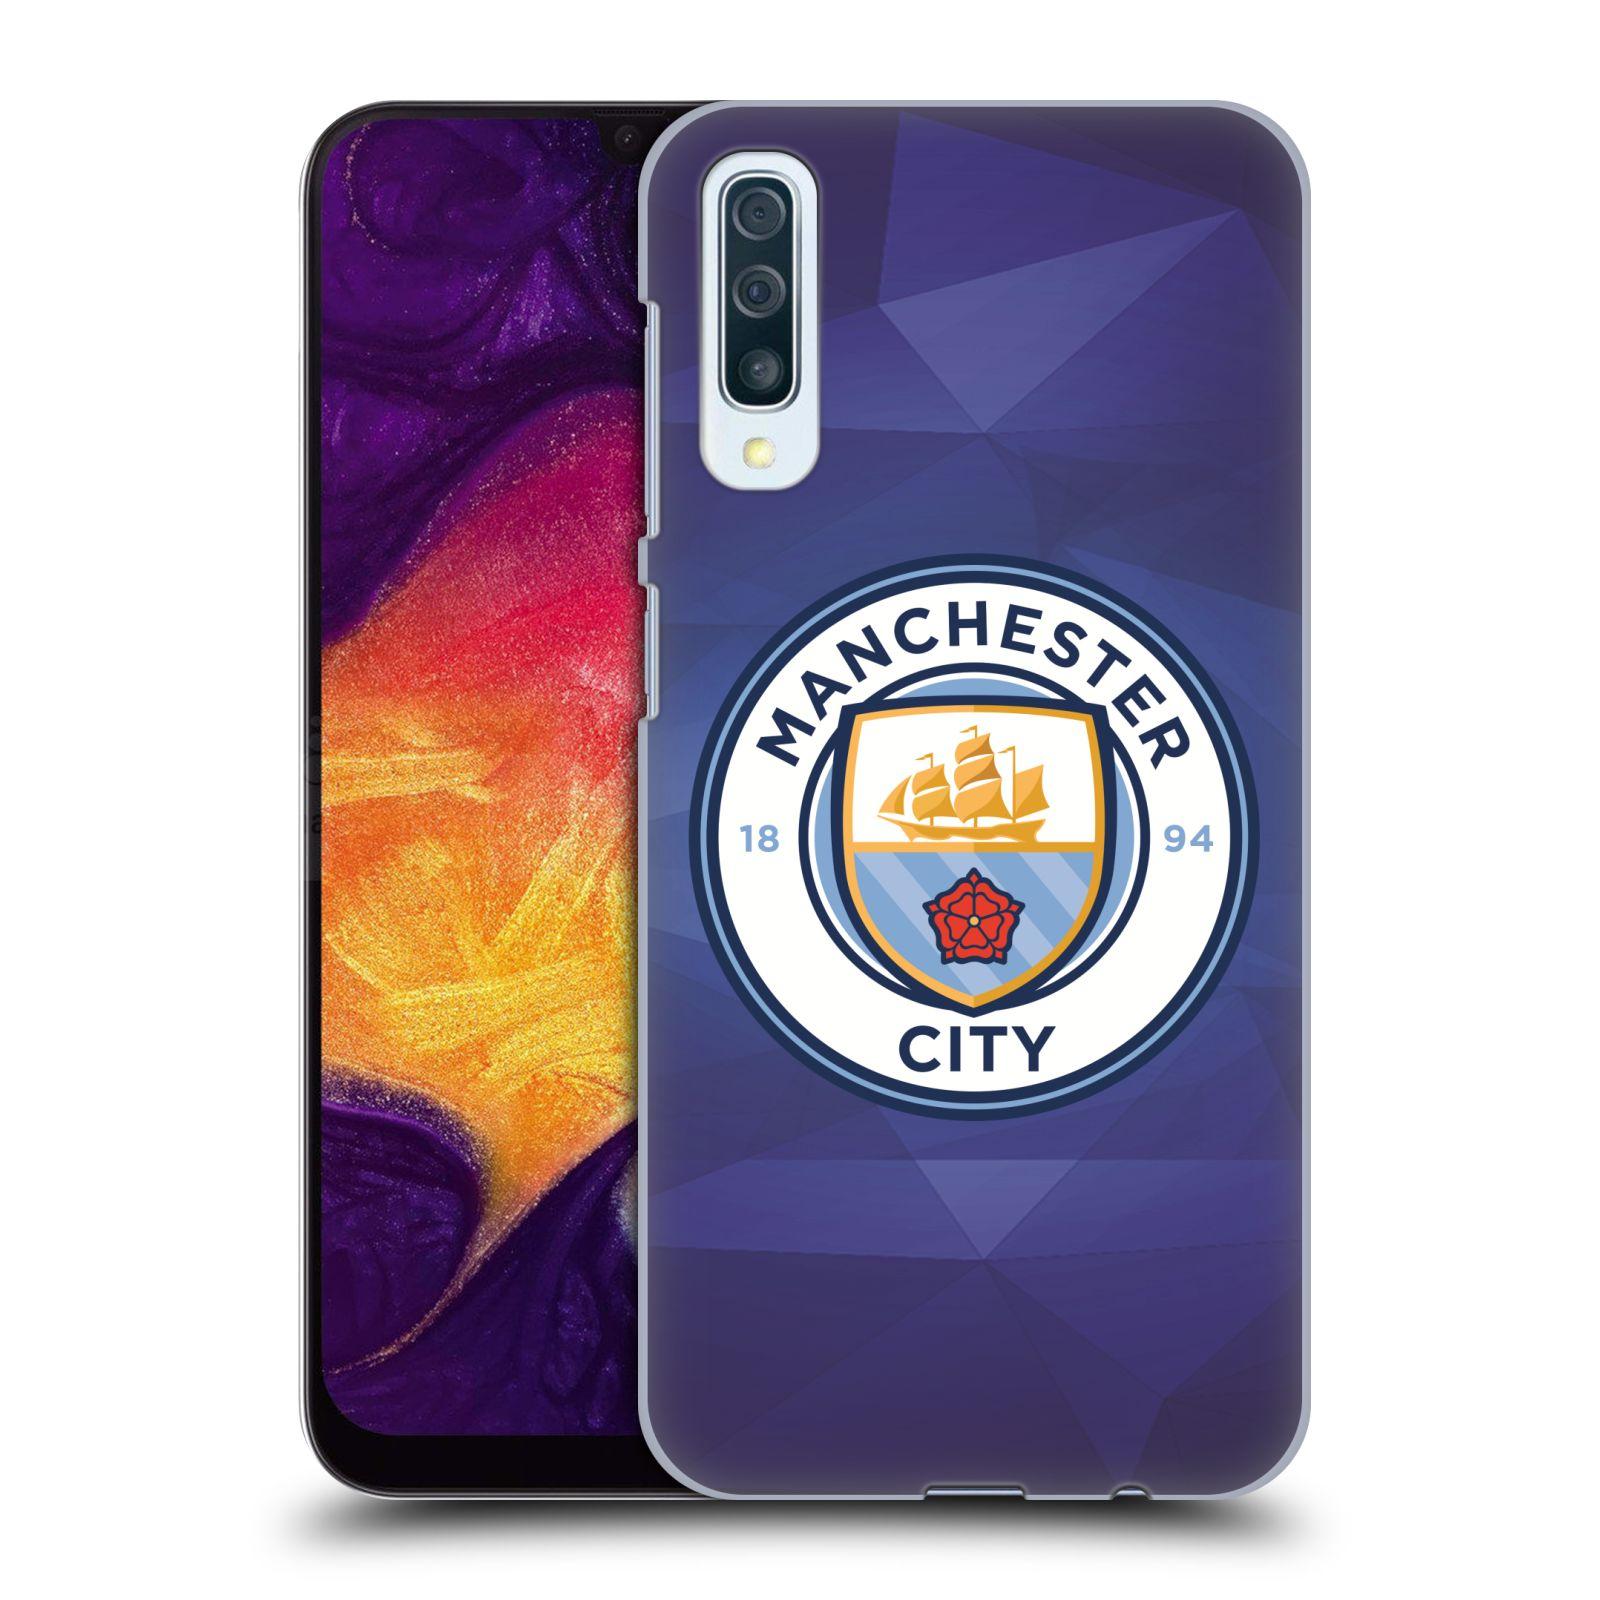 Plastové pouzdro na mobil Samsung Galaxy A50 - Head Case - Manchester City FC - Modré nové logo